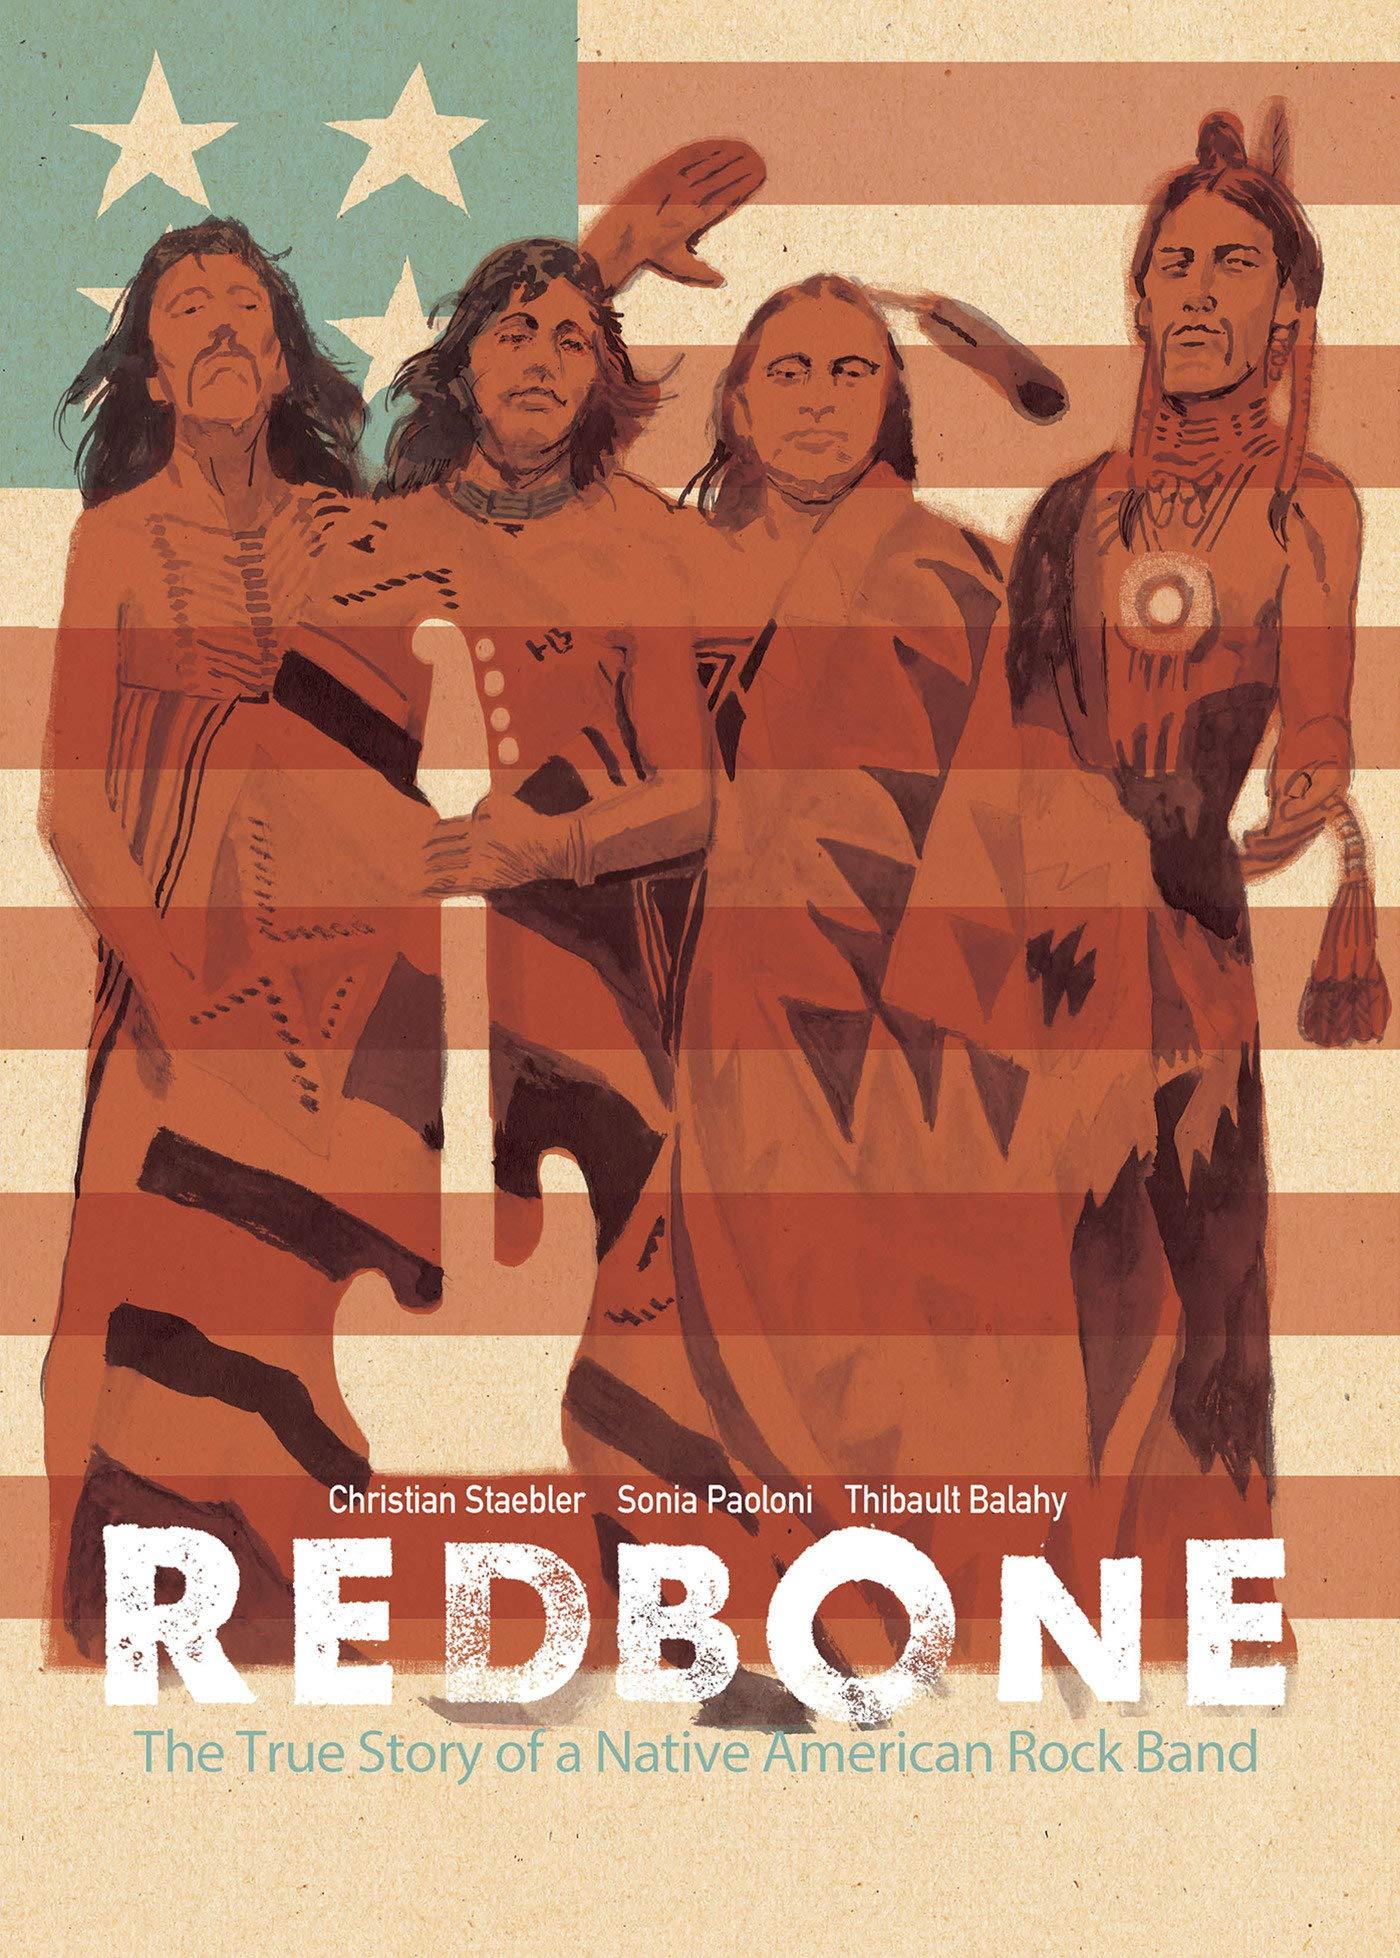 Redbone by Christian Staebler